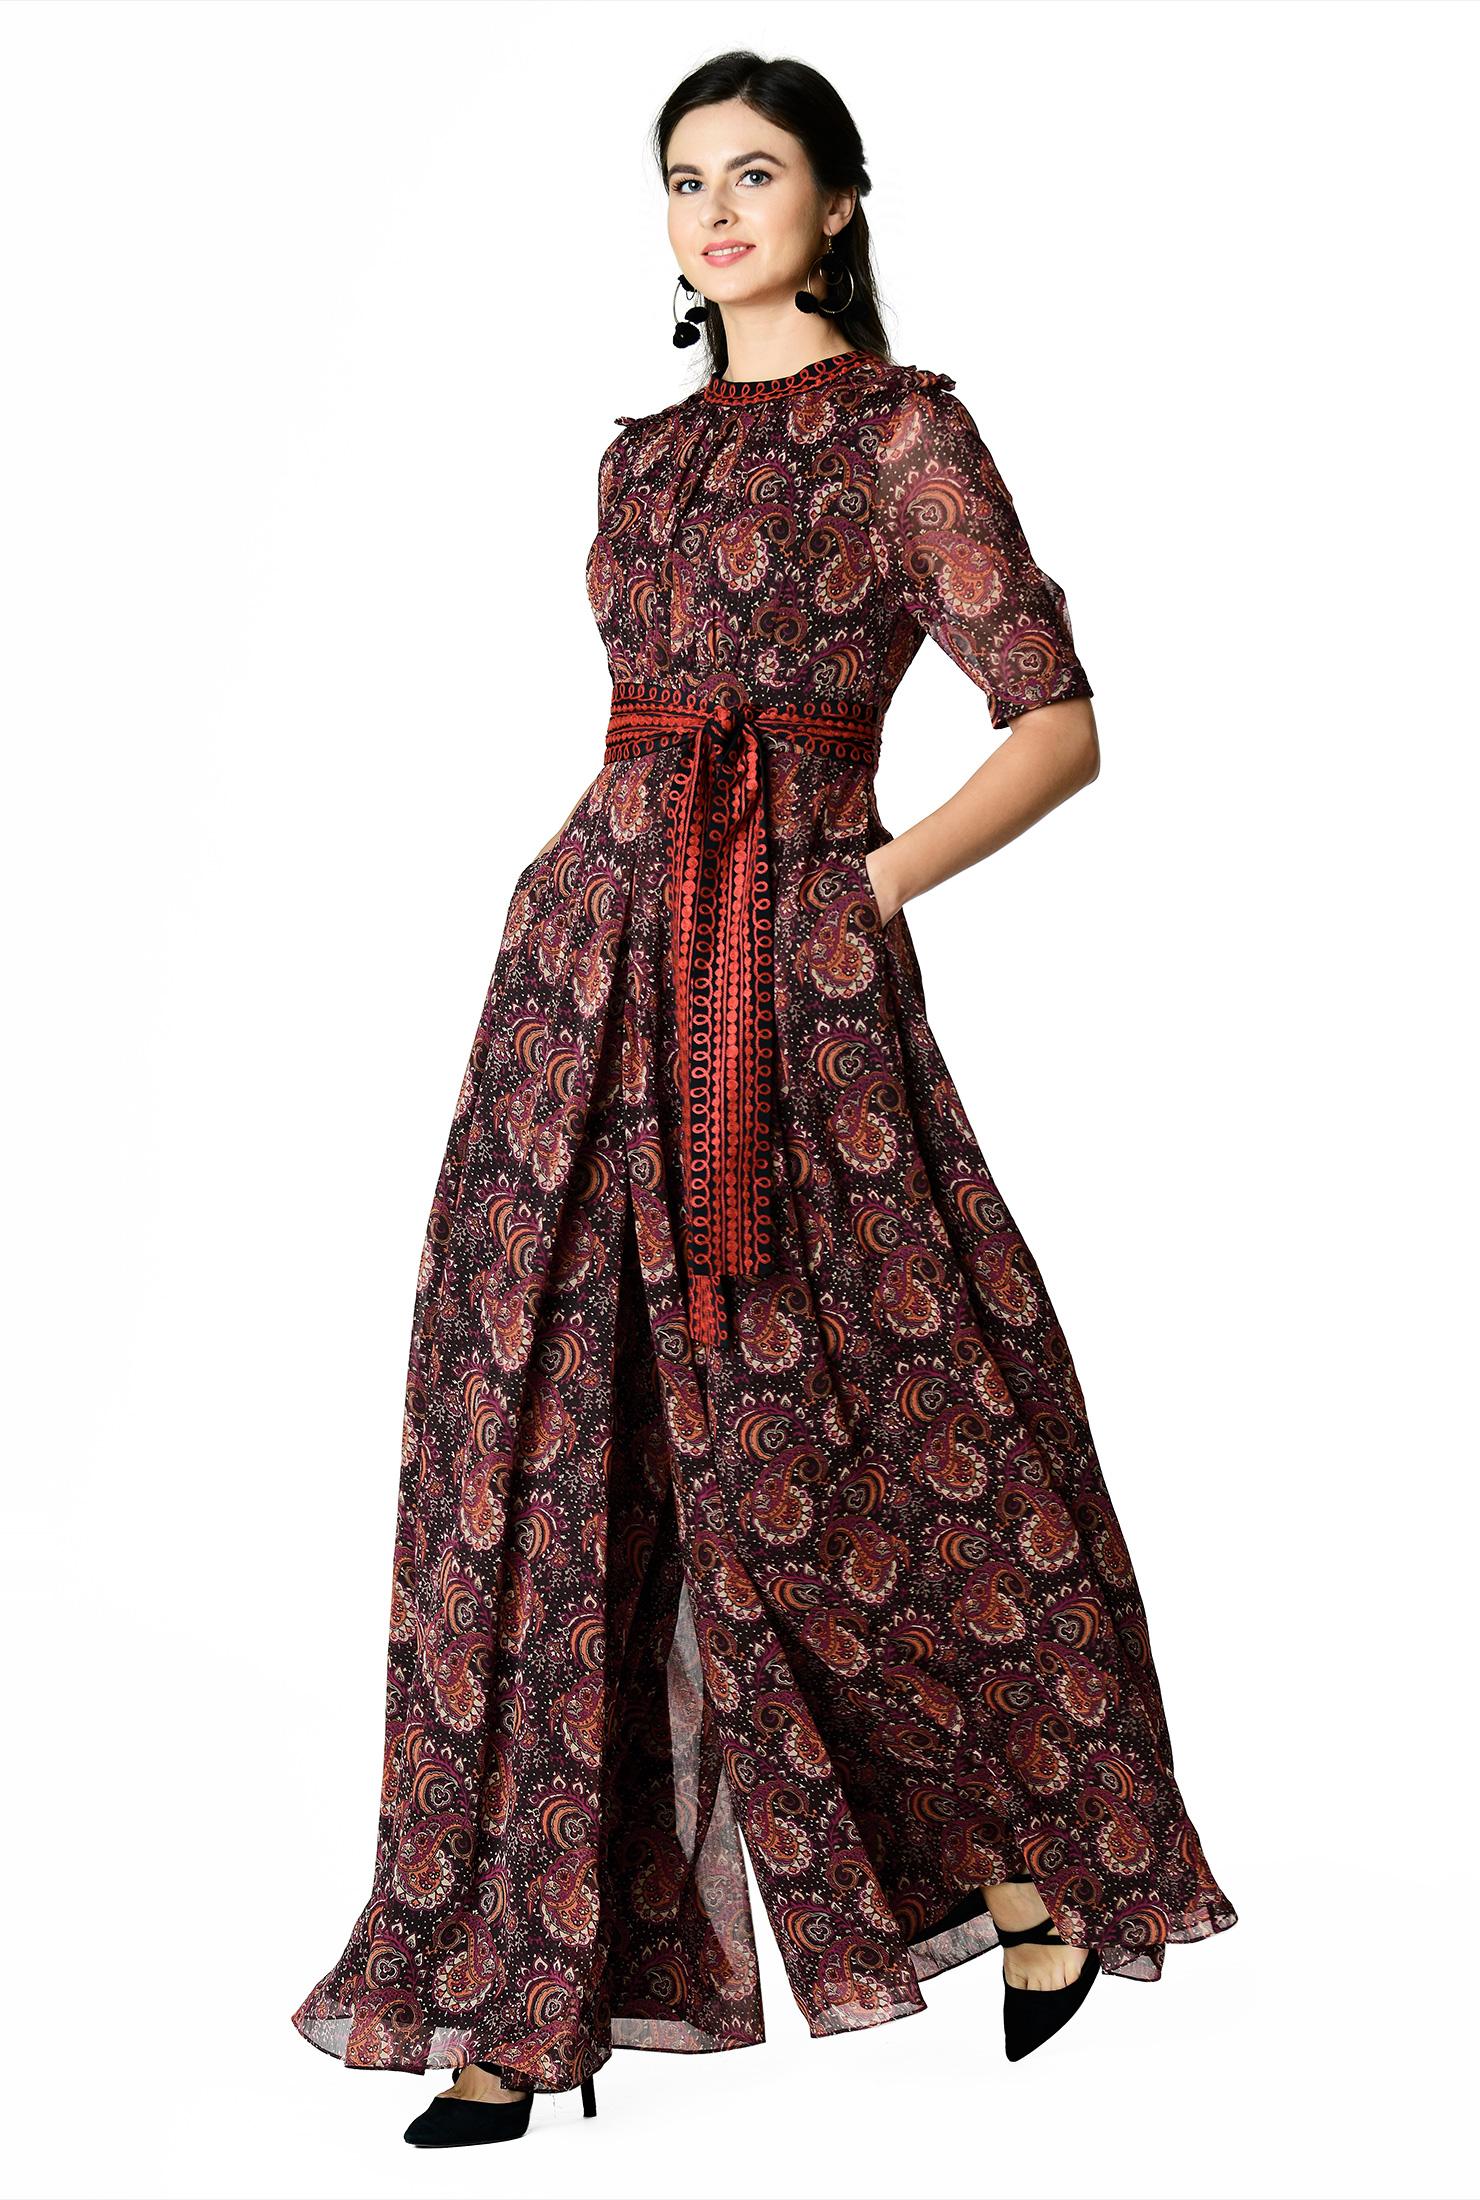 44a70126c9b Women s Fashion Clothing 0-36W and Custom